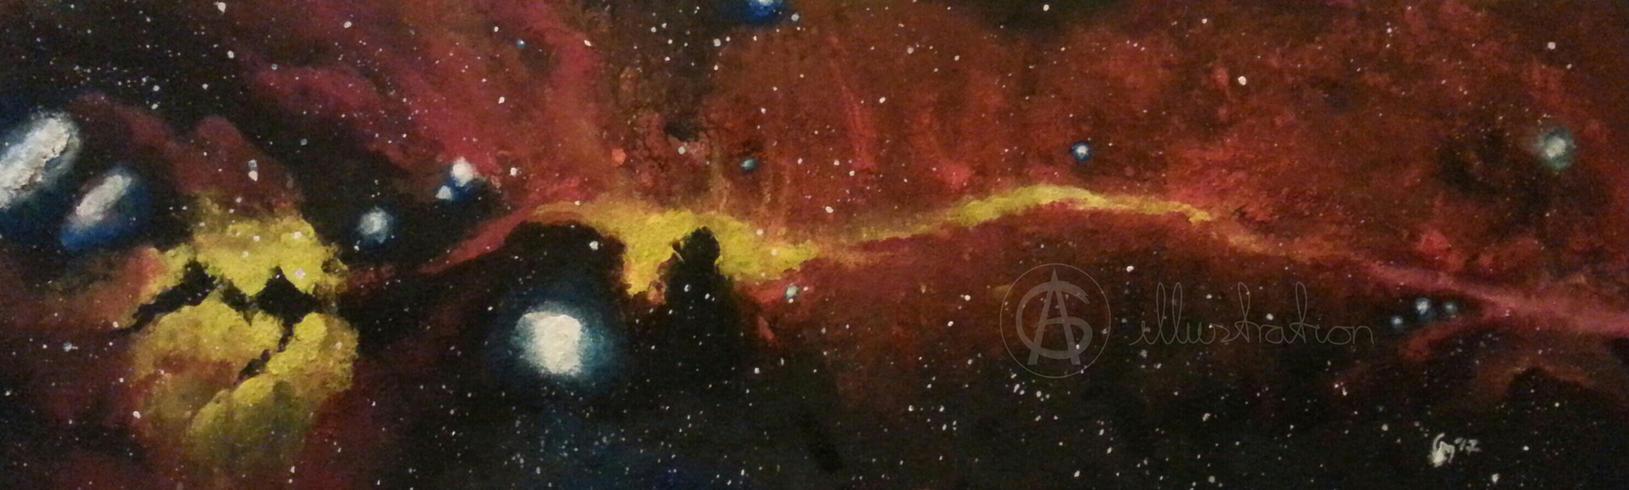 Nebula Lightning Red by AG-sArt